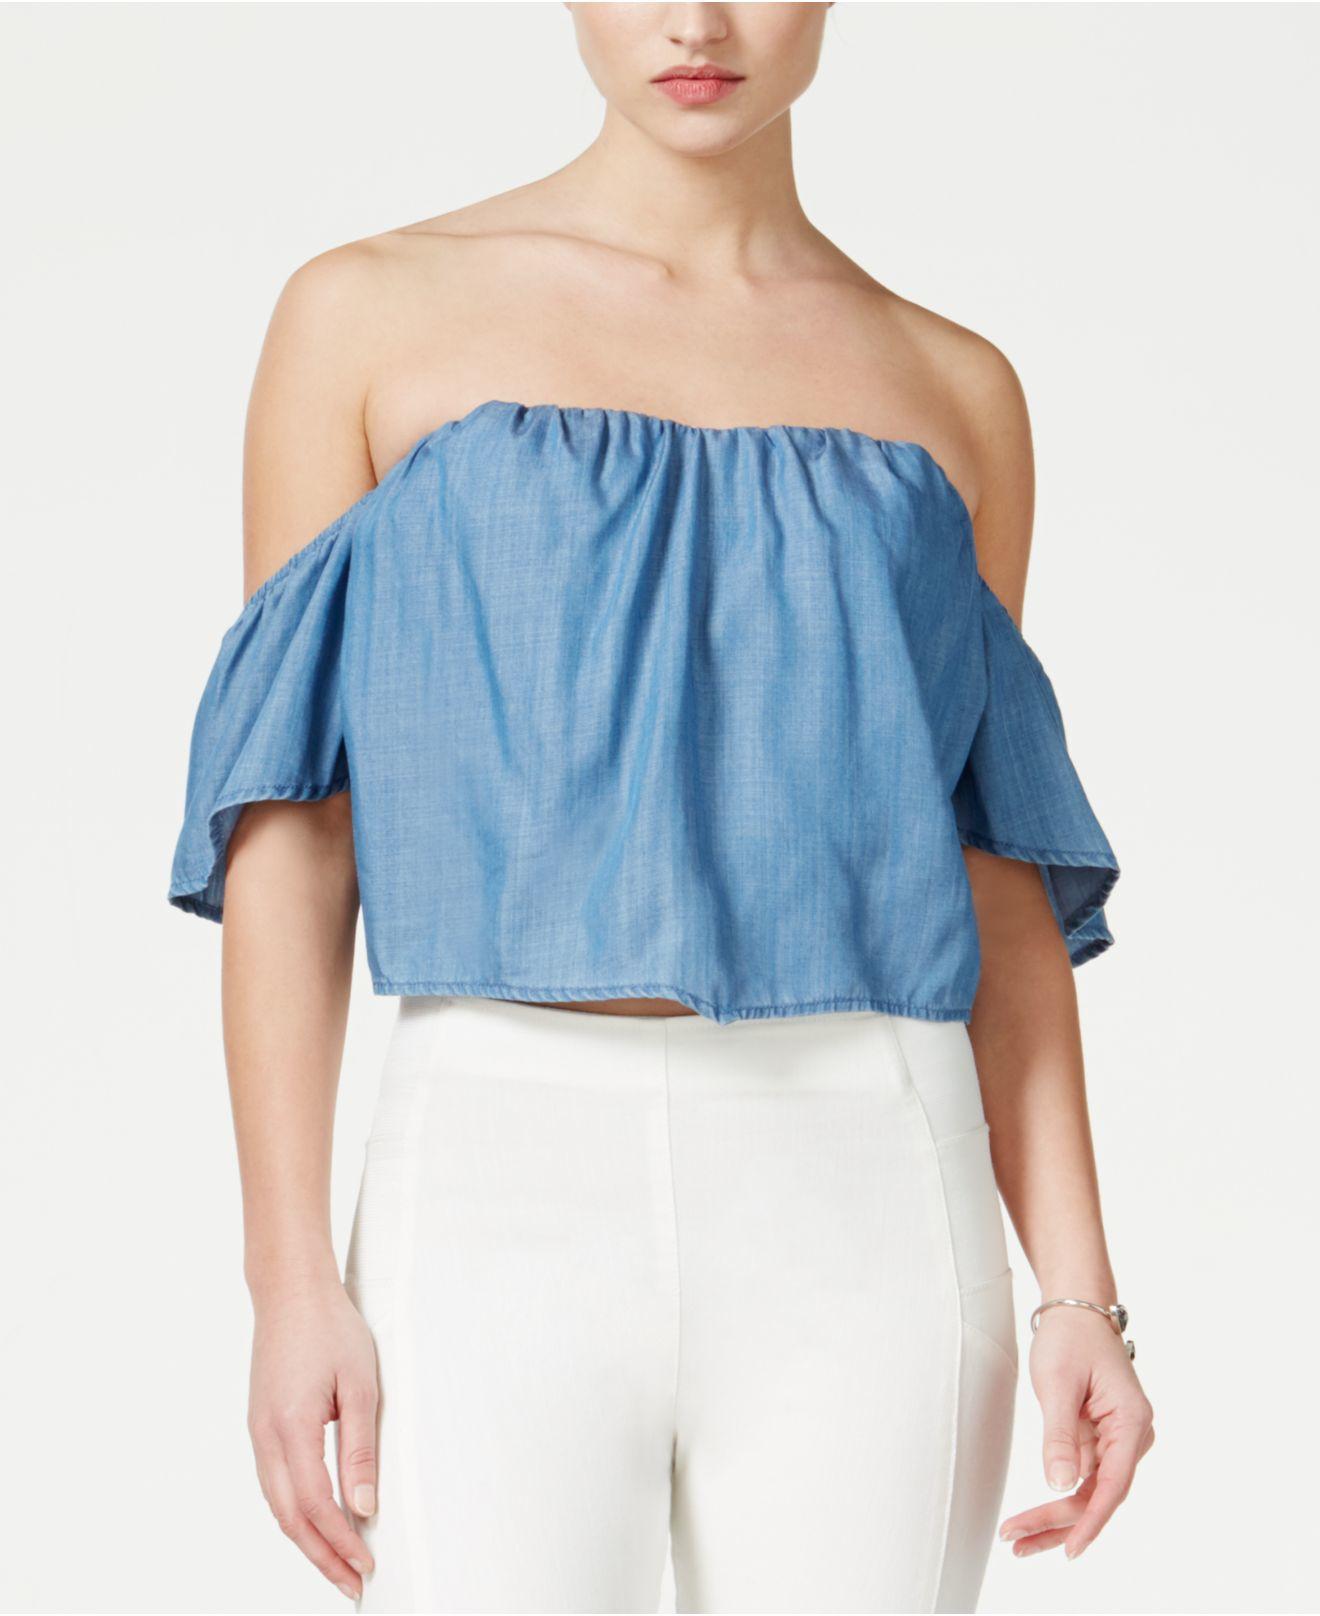 Guess Denim Off-the-shoulder Corset Crop Top in Blue | Lyst